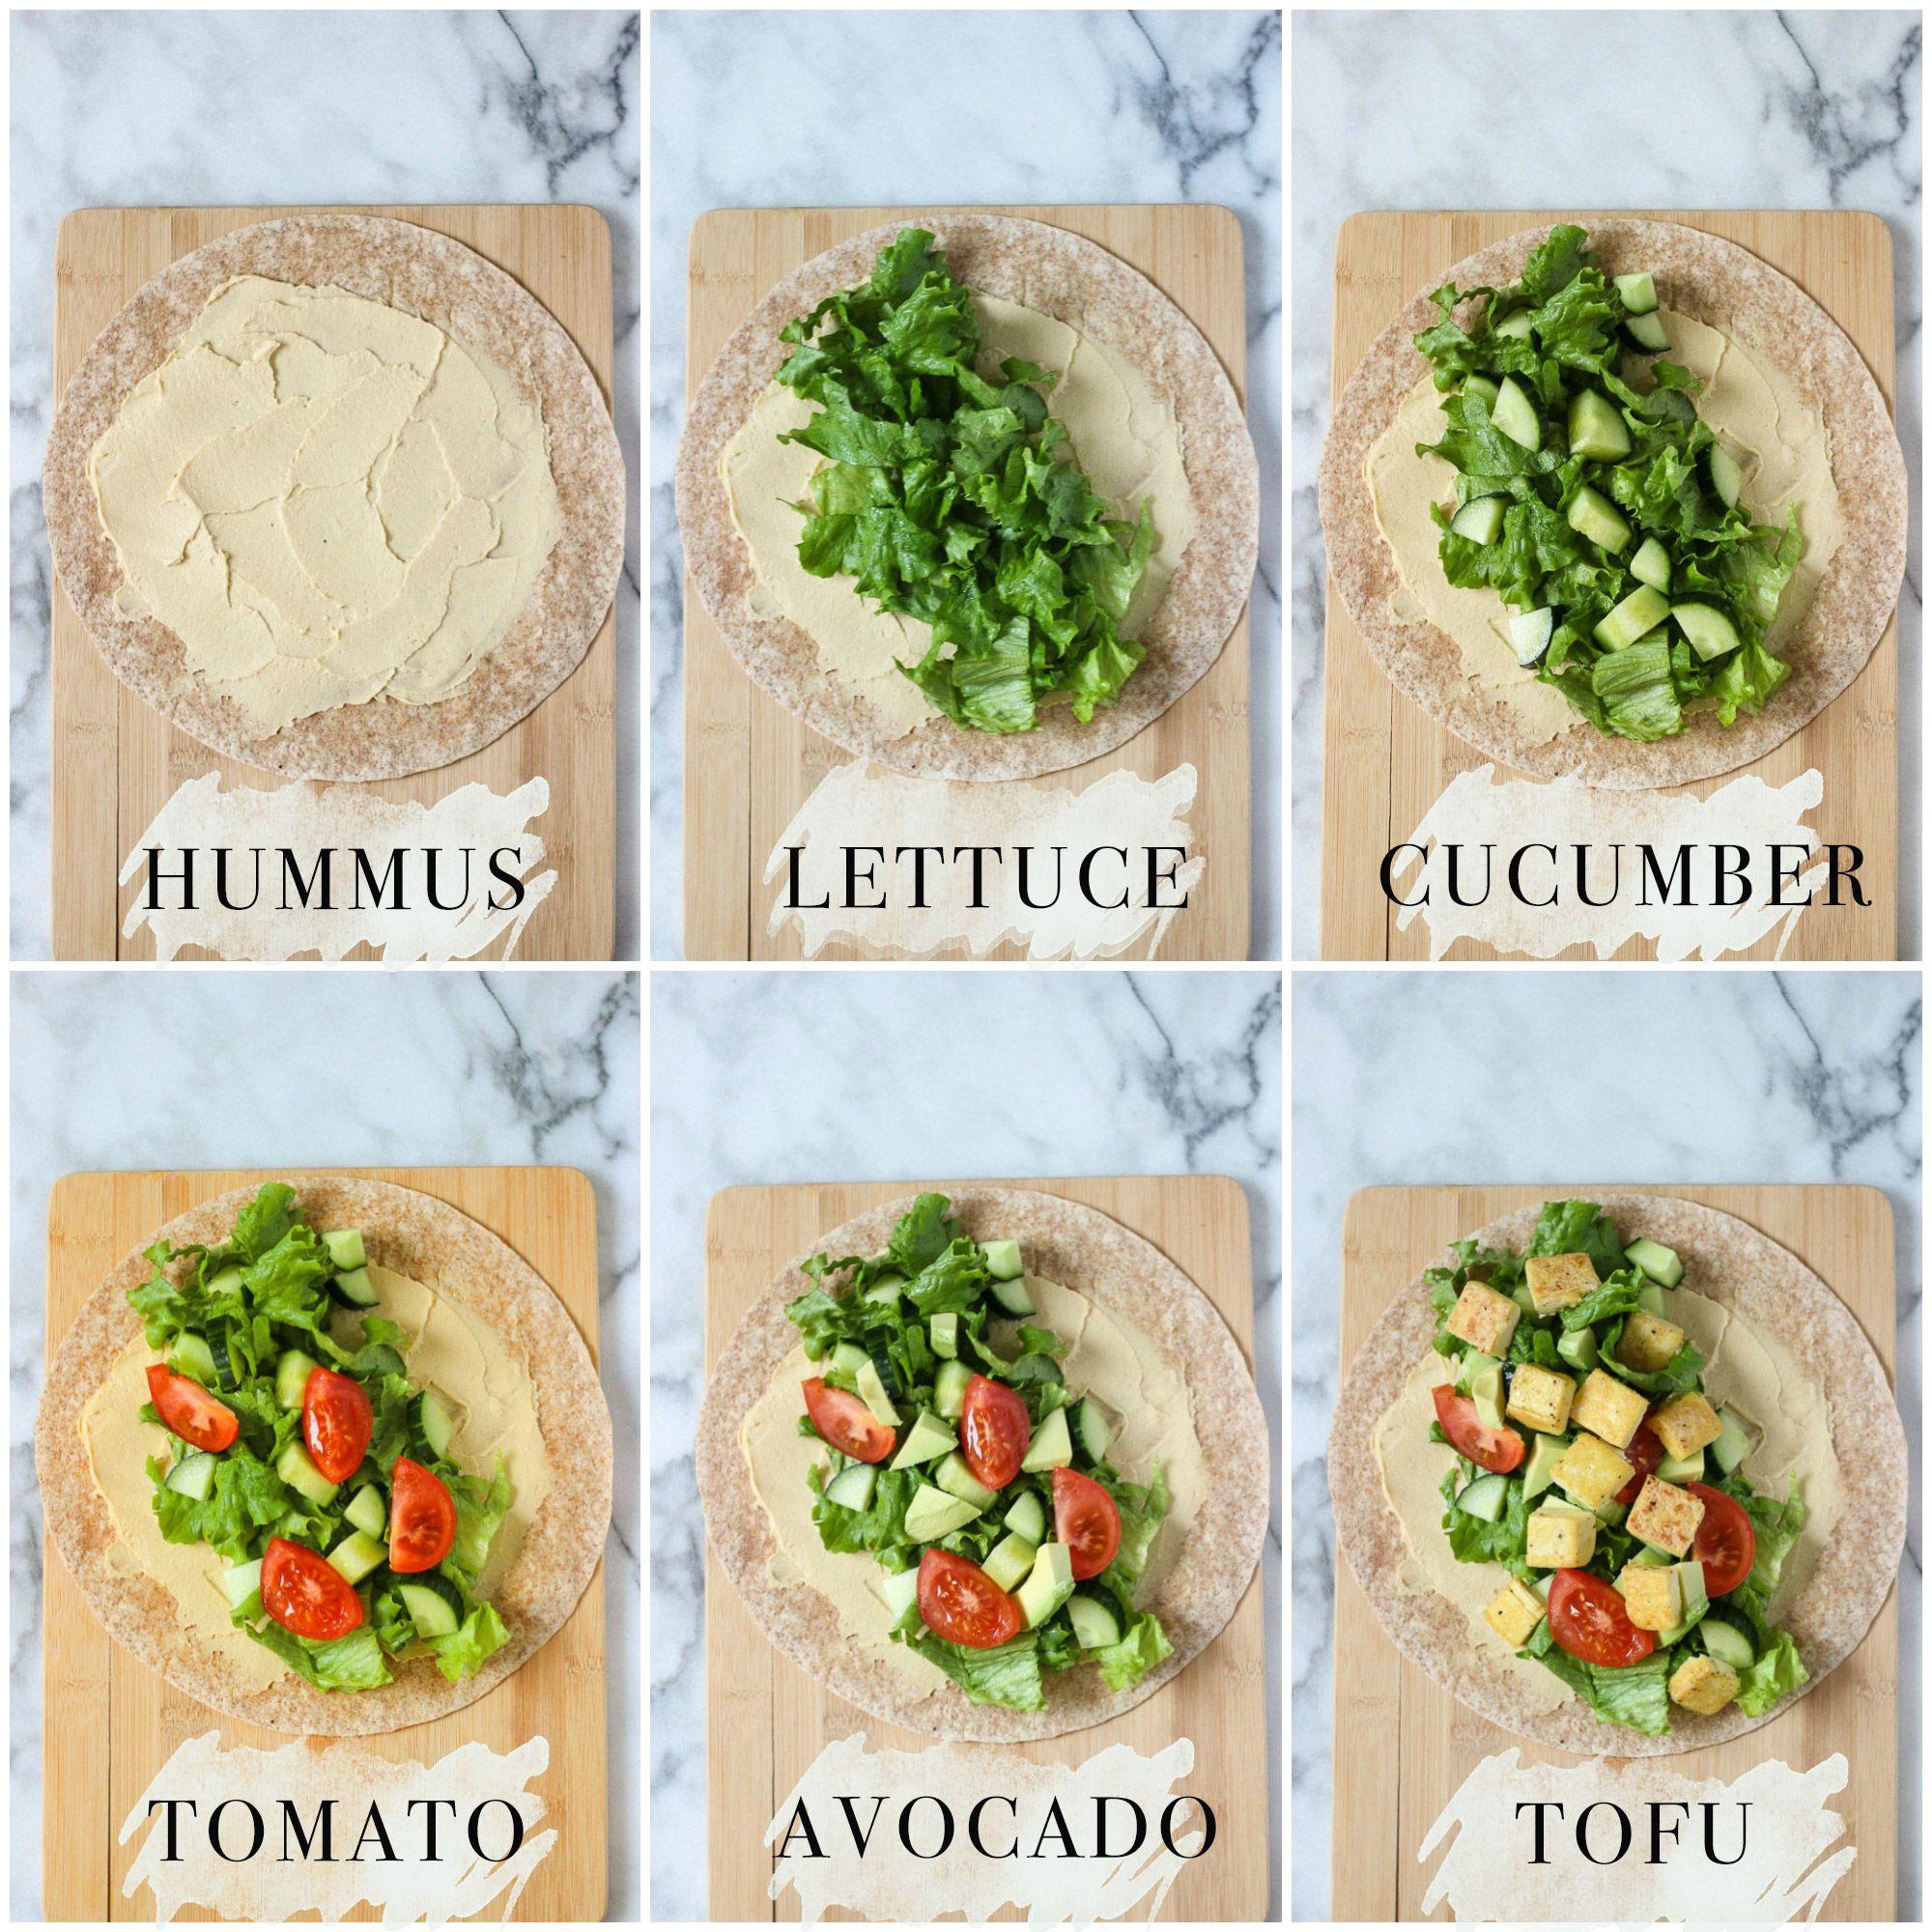 Crispy tofu hummus wraps lunch idea receta recetas crispy tofu hummus wrap recipe is the perfect healthy lunch idea easy to make forumfinder Image collections